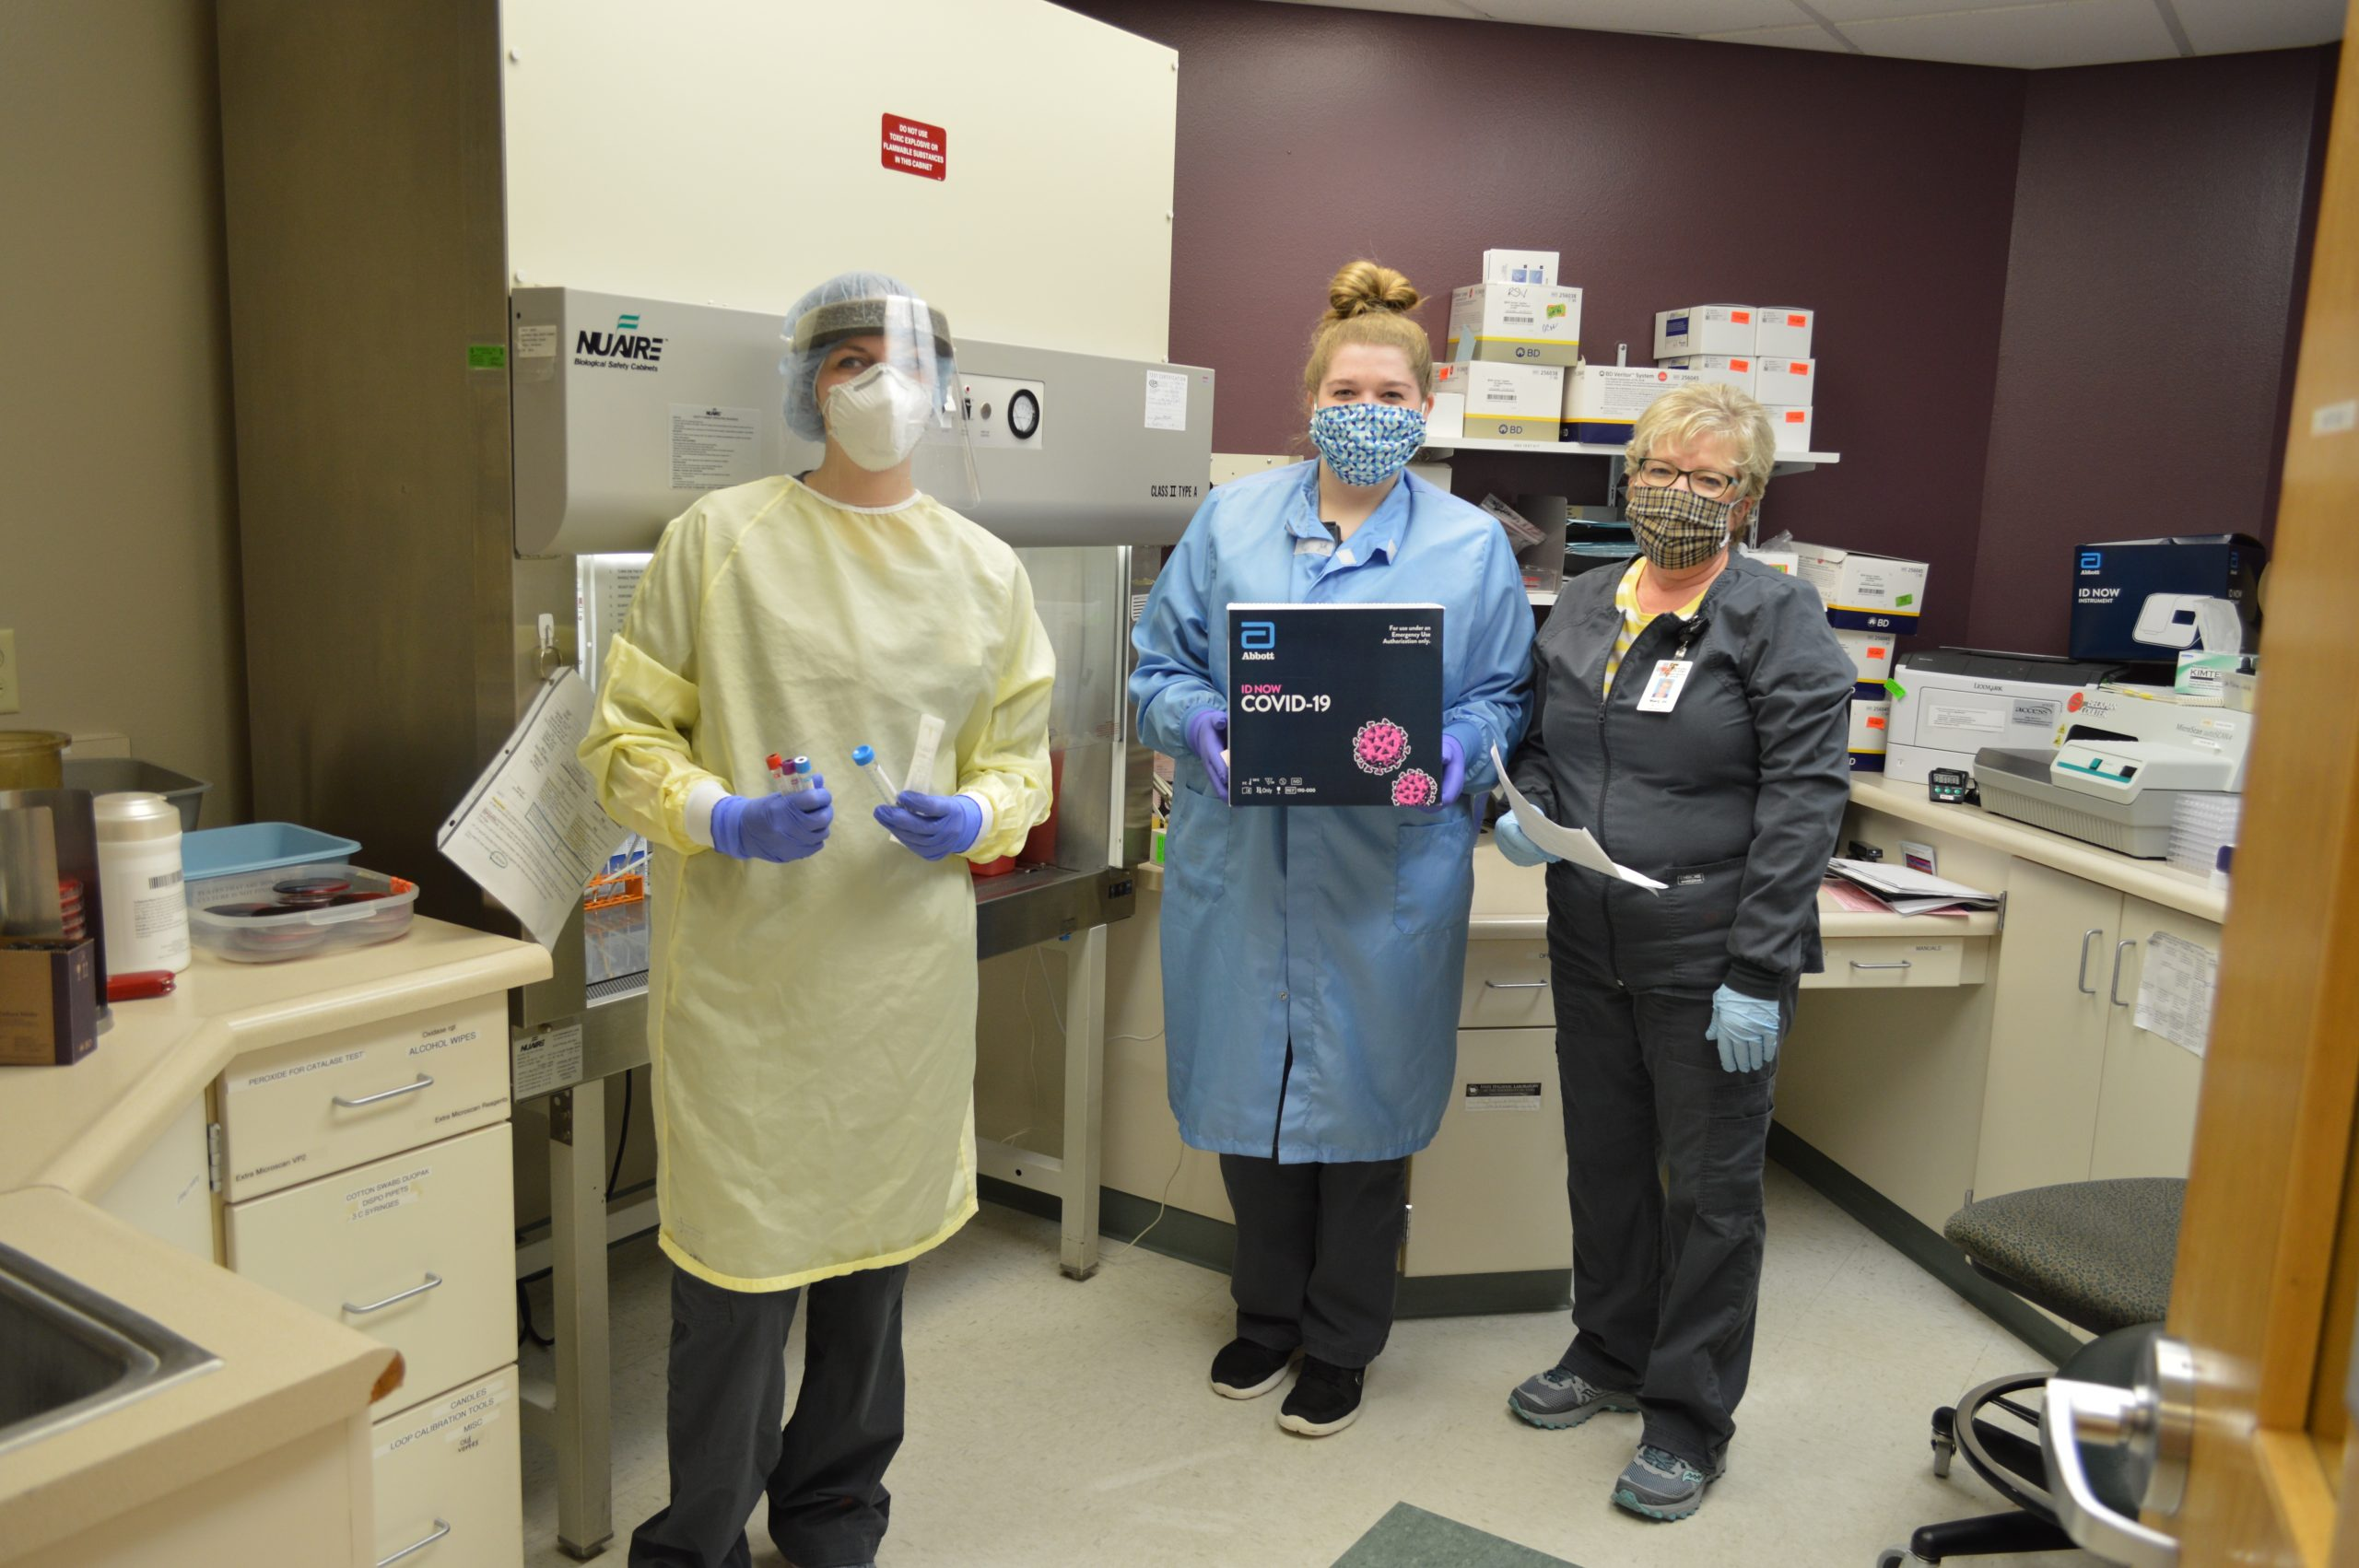 Veterans Memorial Hospital Still Requires Masks for all Services